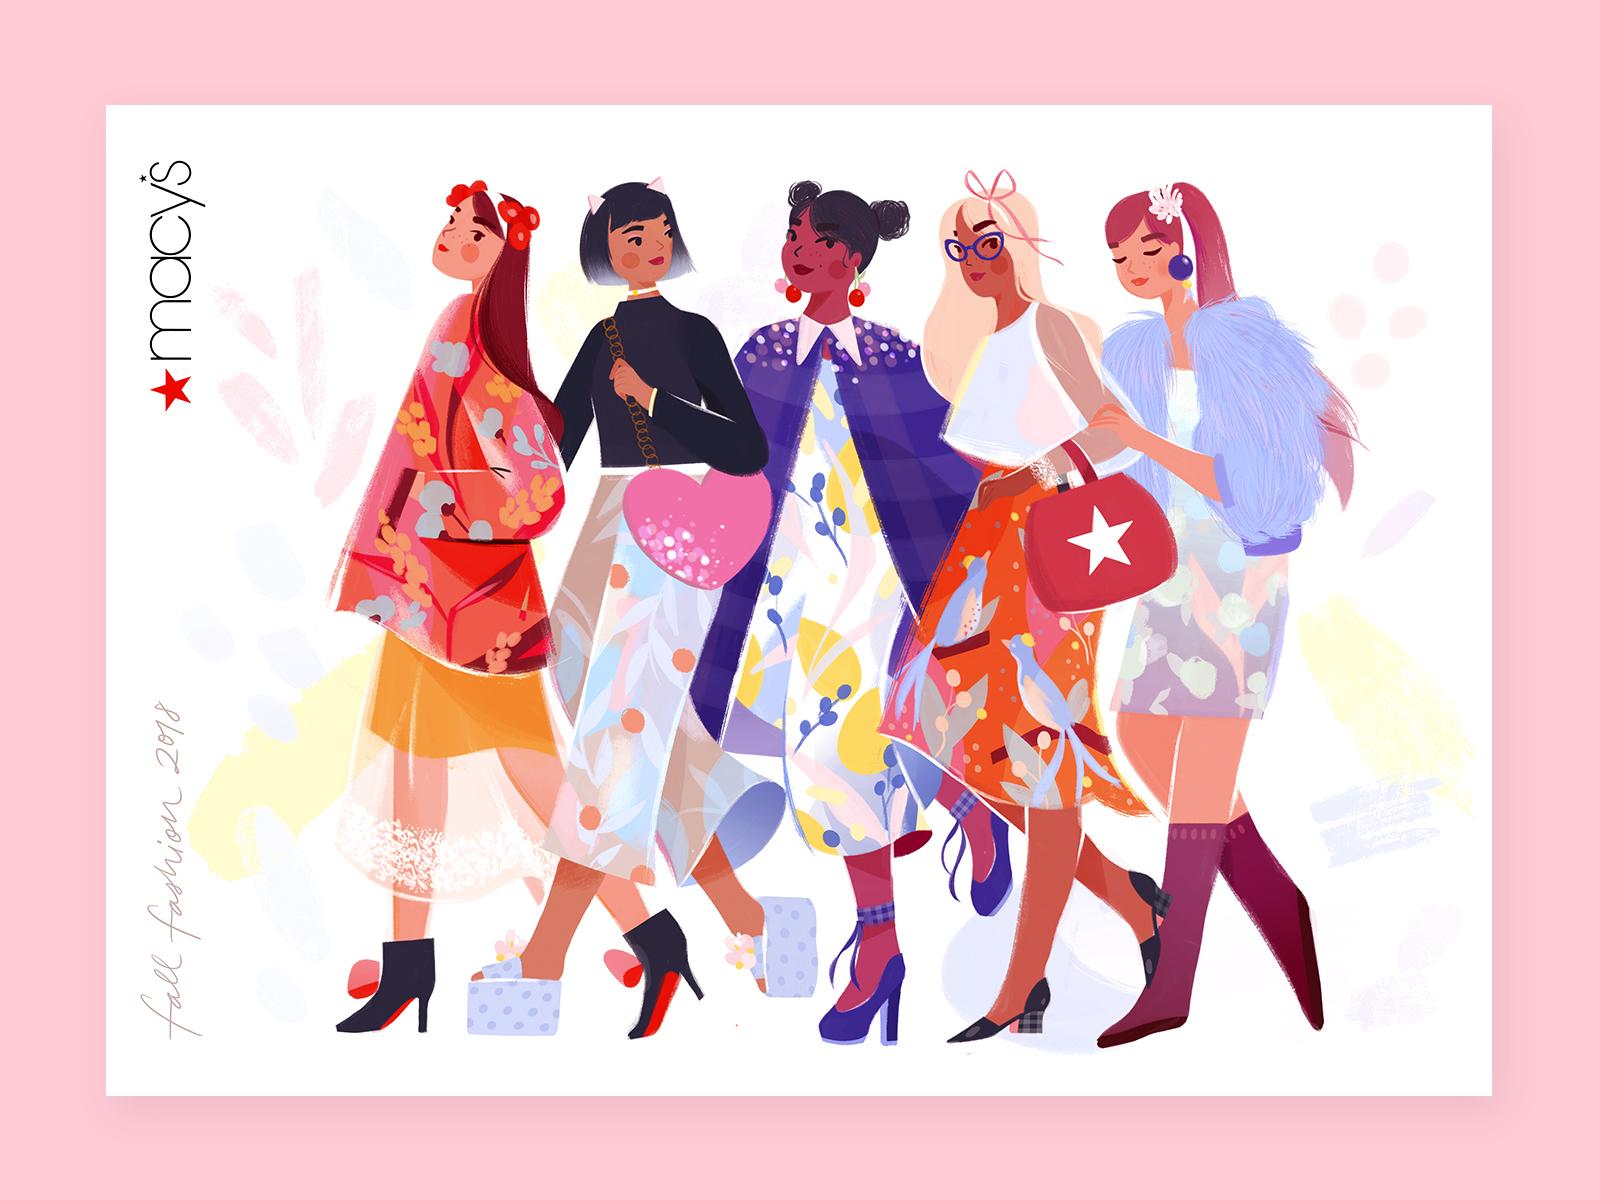 Macy's — Fall Fashion 2018 macys retail print fall girlsquad characters illustration fashion